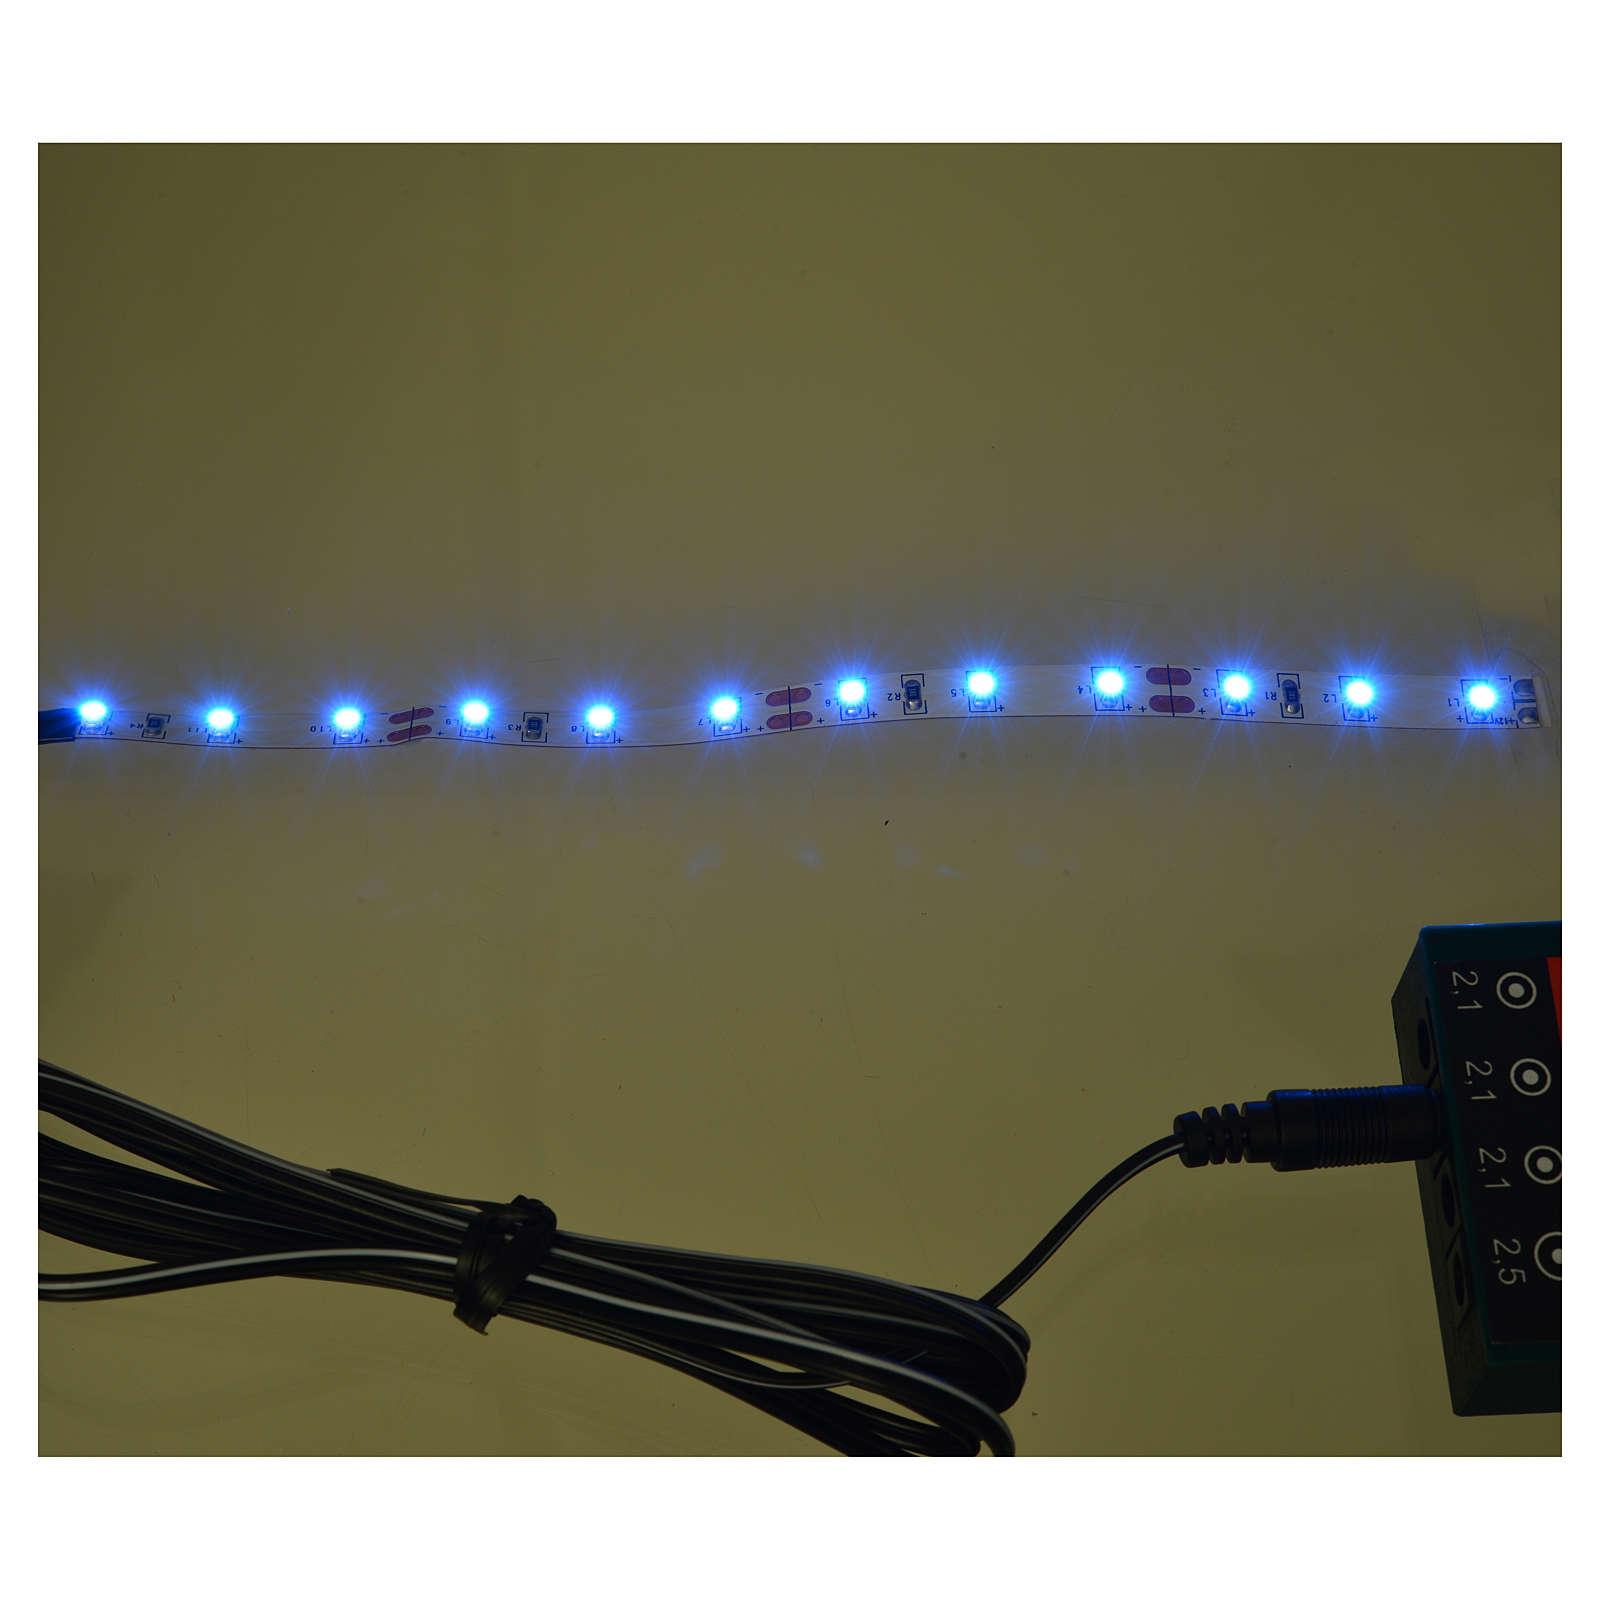 Bande 12 micro-leds pour Frisalight 0,8x16 cm bleu 4